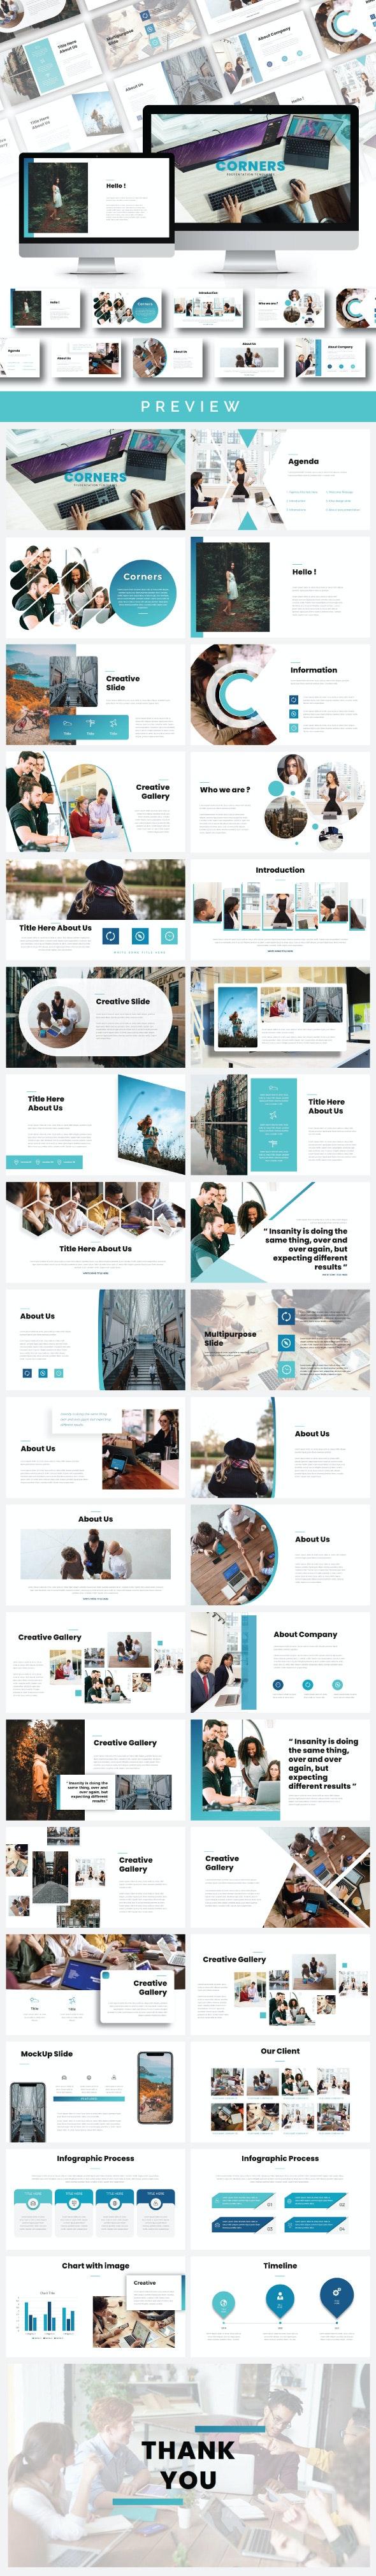 Corners Multipurpose Keynote Template - Creative Keynote Templates